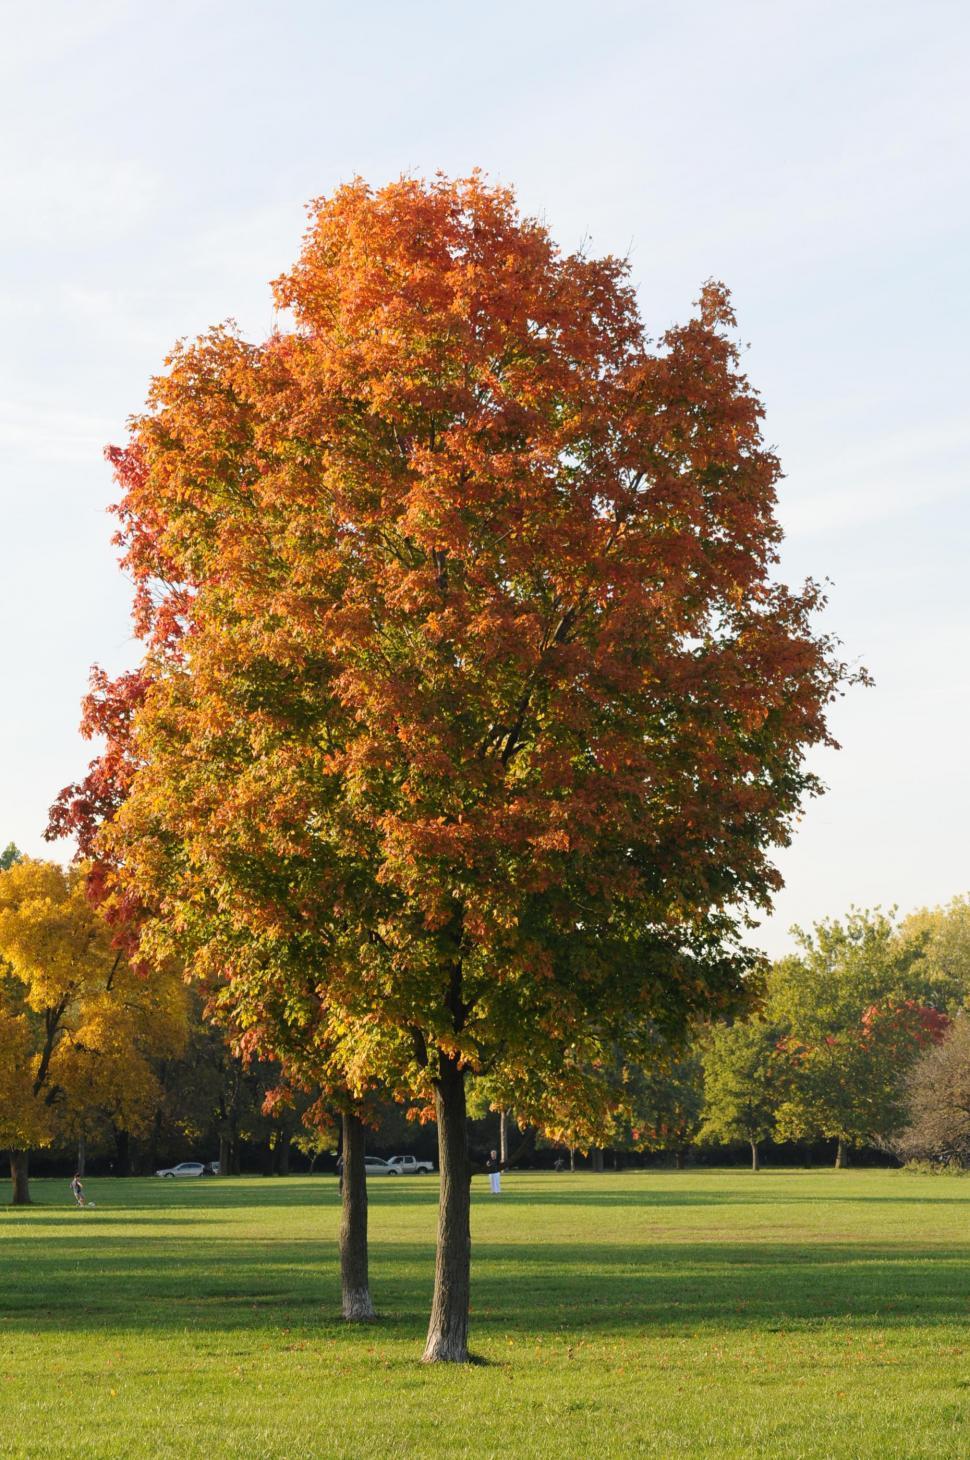 Download Free Stock Photo of Autumn tree